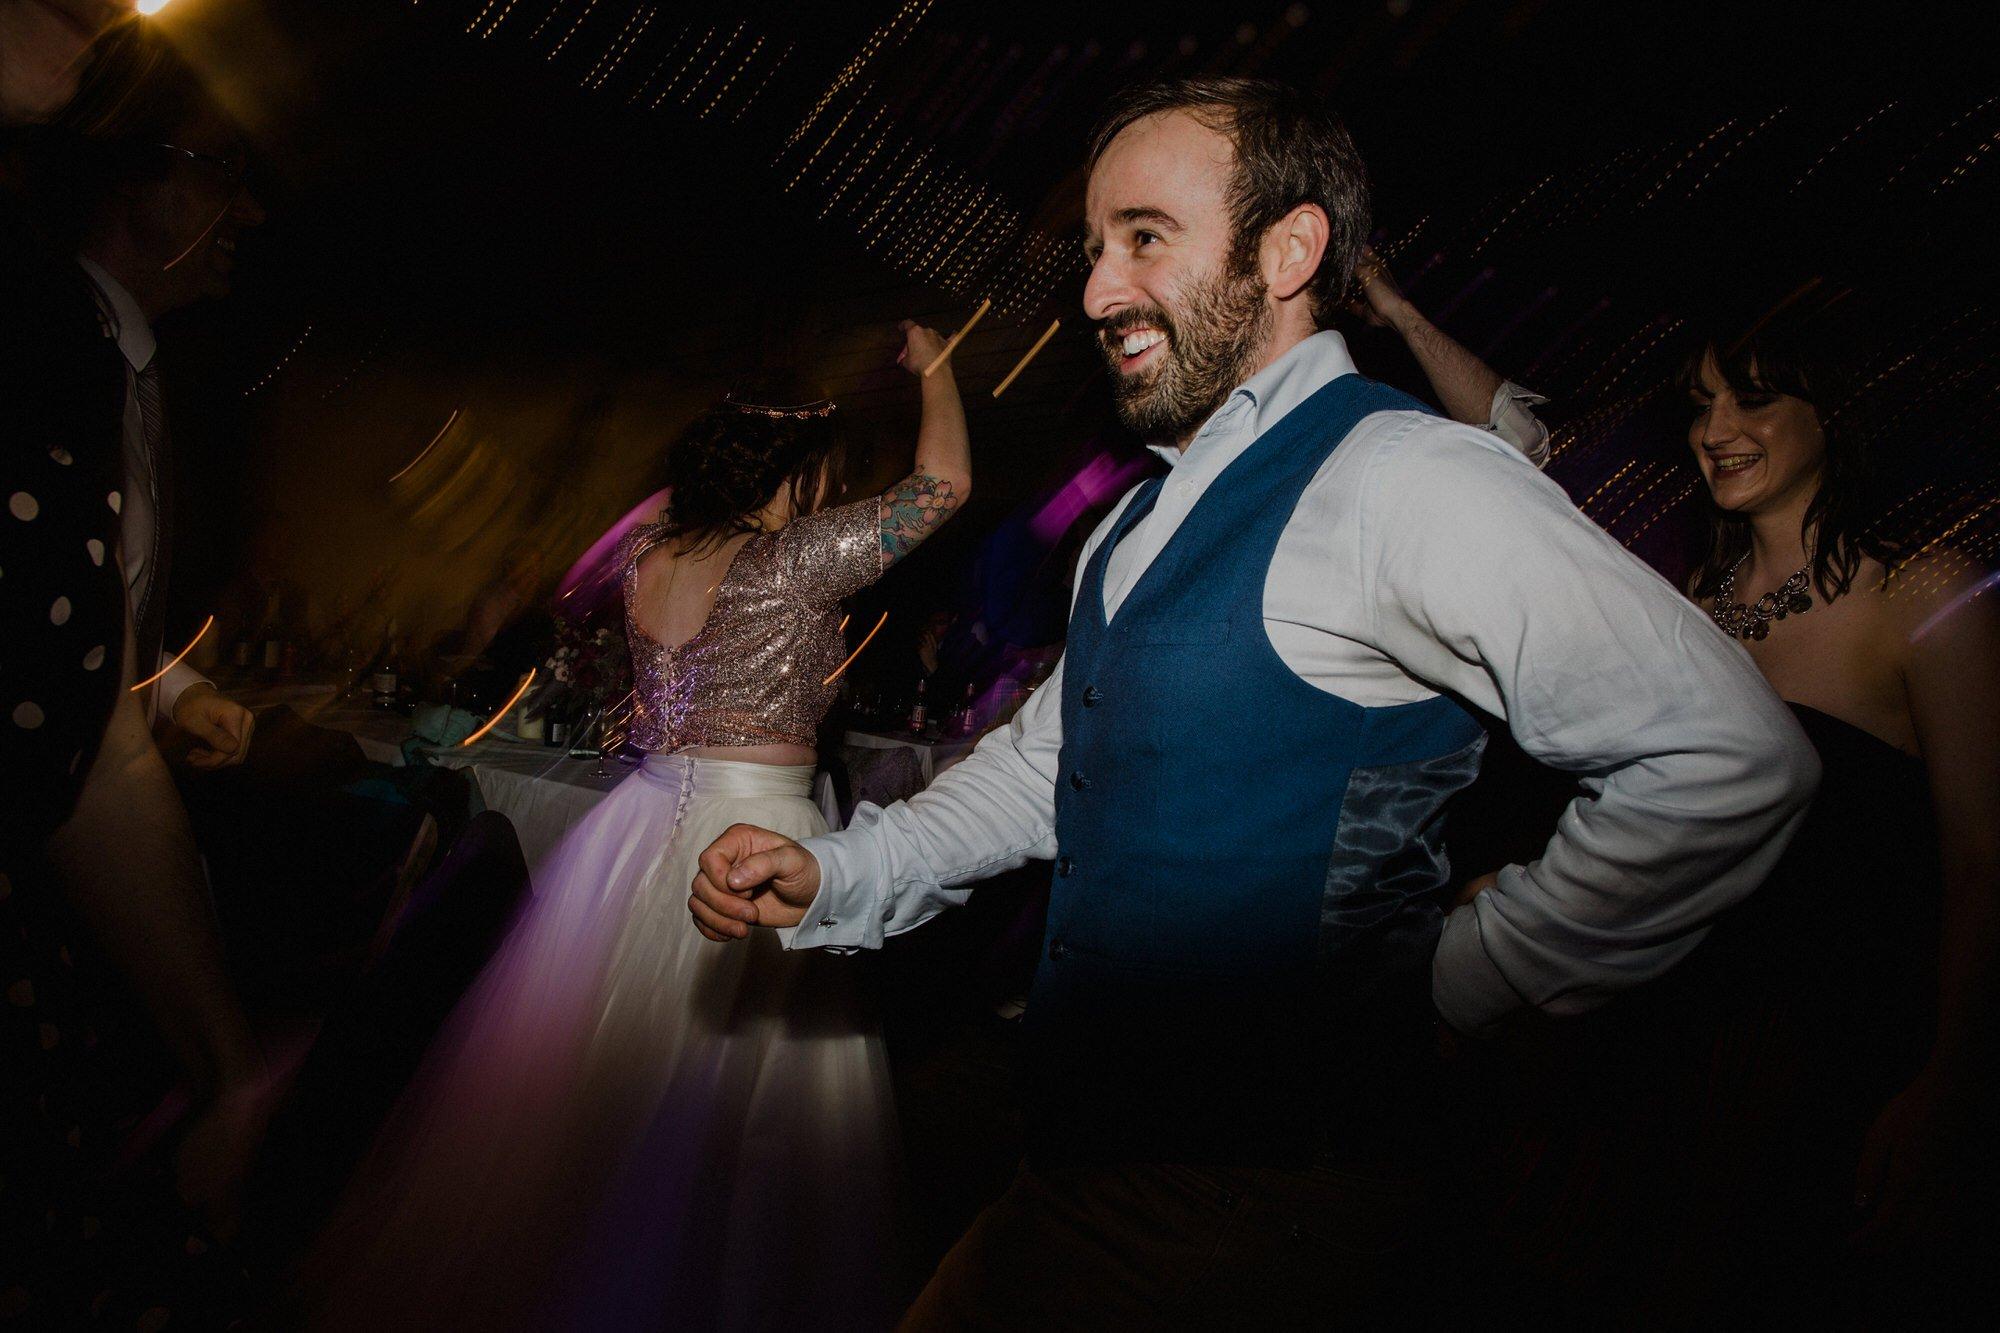 079 TIN SHED KNOCKRAICH FARM WEDDING ALTERNATIVE BRIDE ZOE ALEXANDRA PHOTOGRAPHY